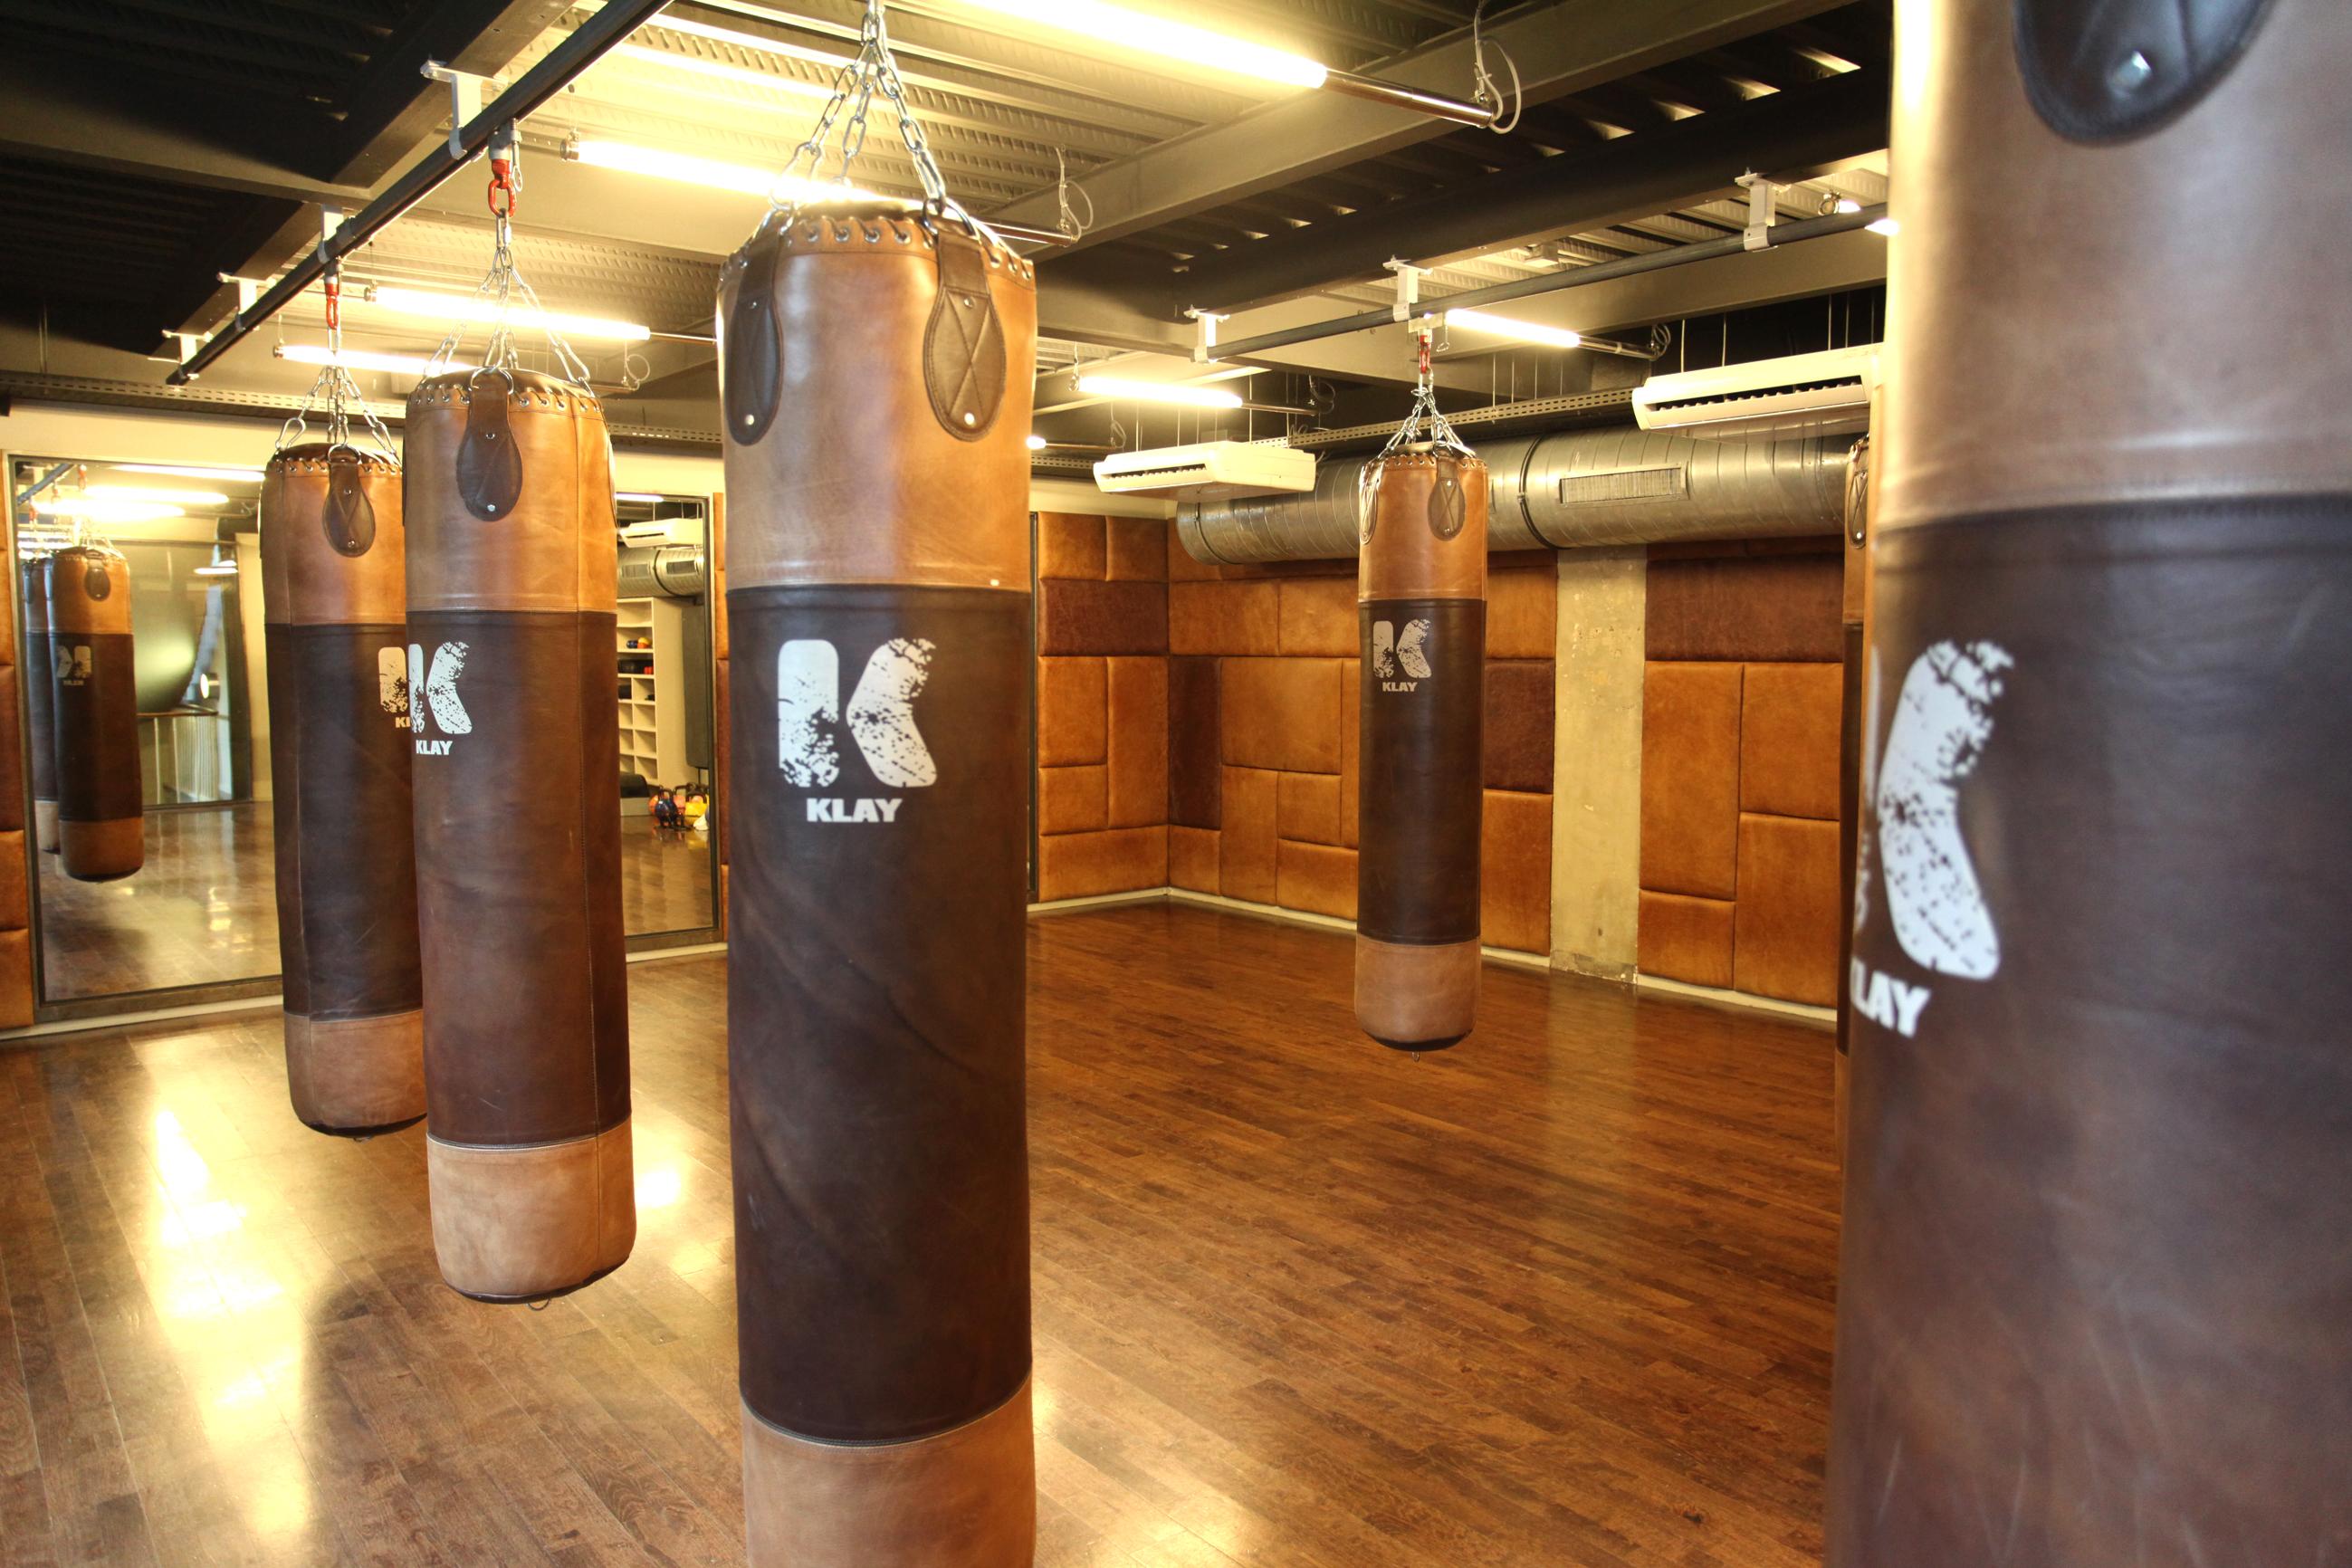 Awesome Klay Salle De Sport Images - Transformatorio.us ...